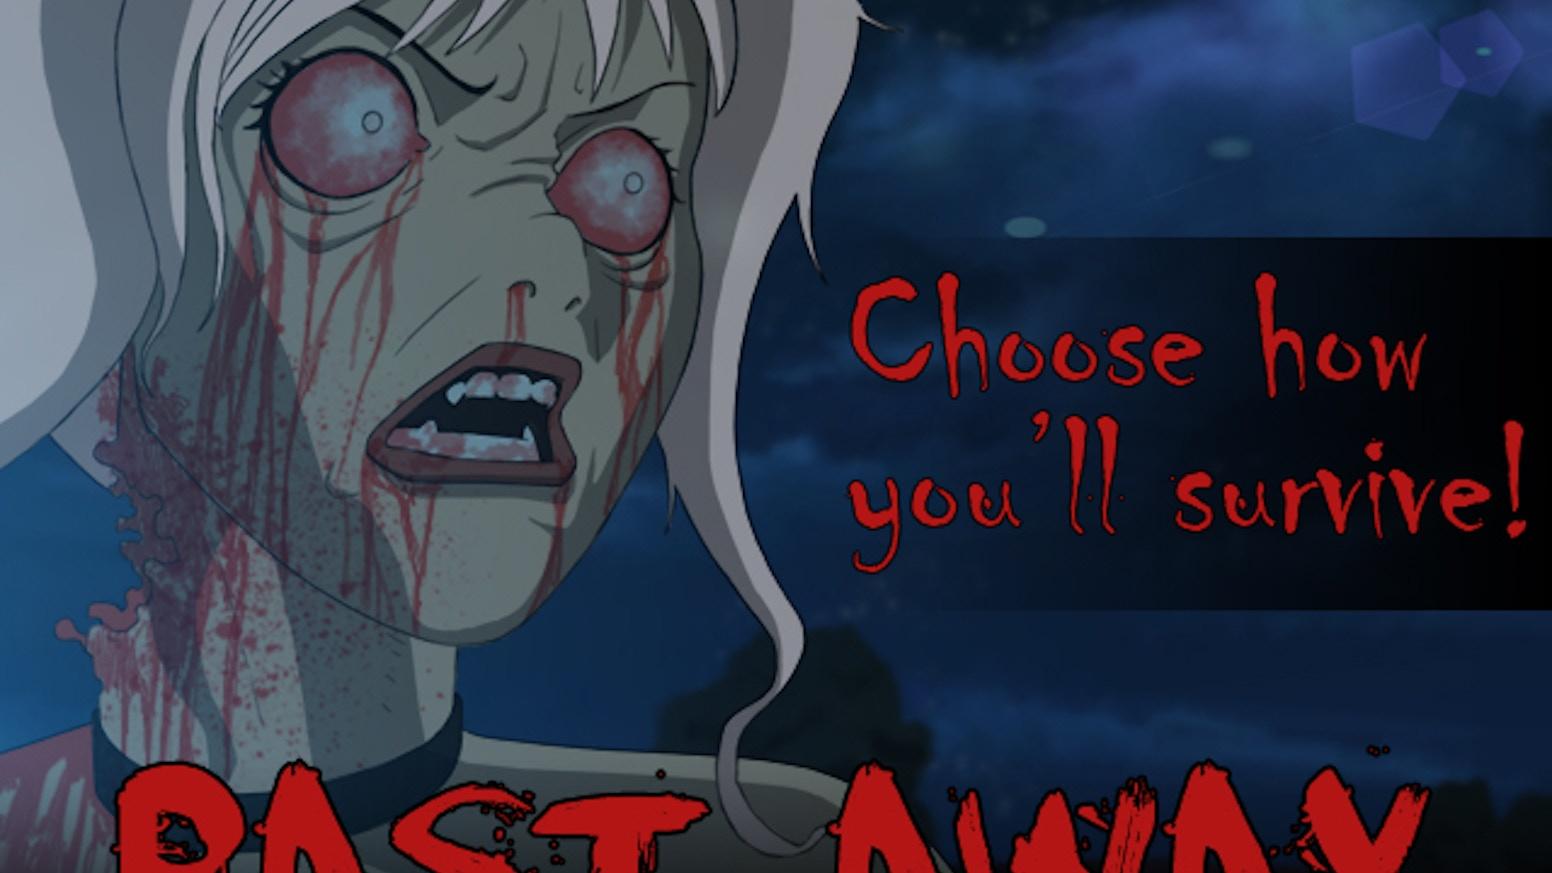 A Sci-fi Survival Horror motion comic, that lets you choose how you'll survive.